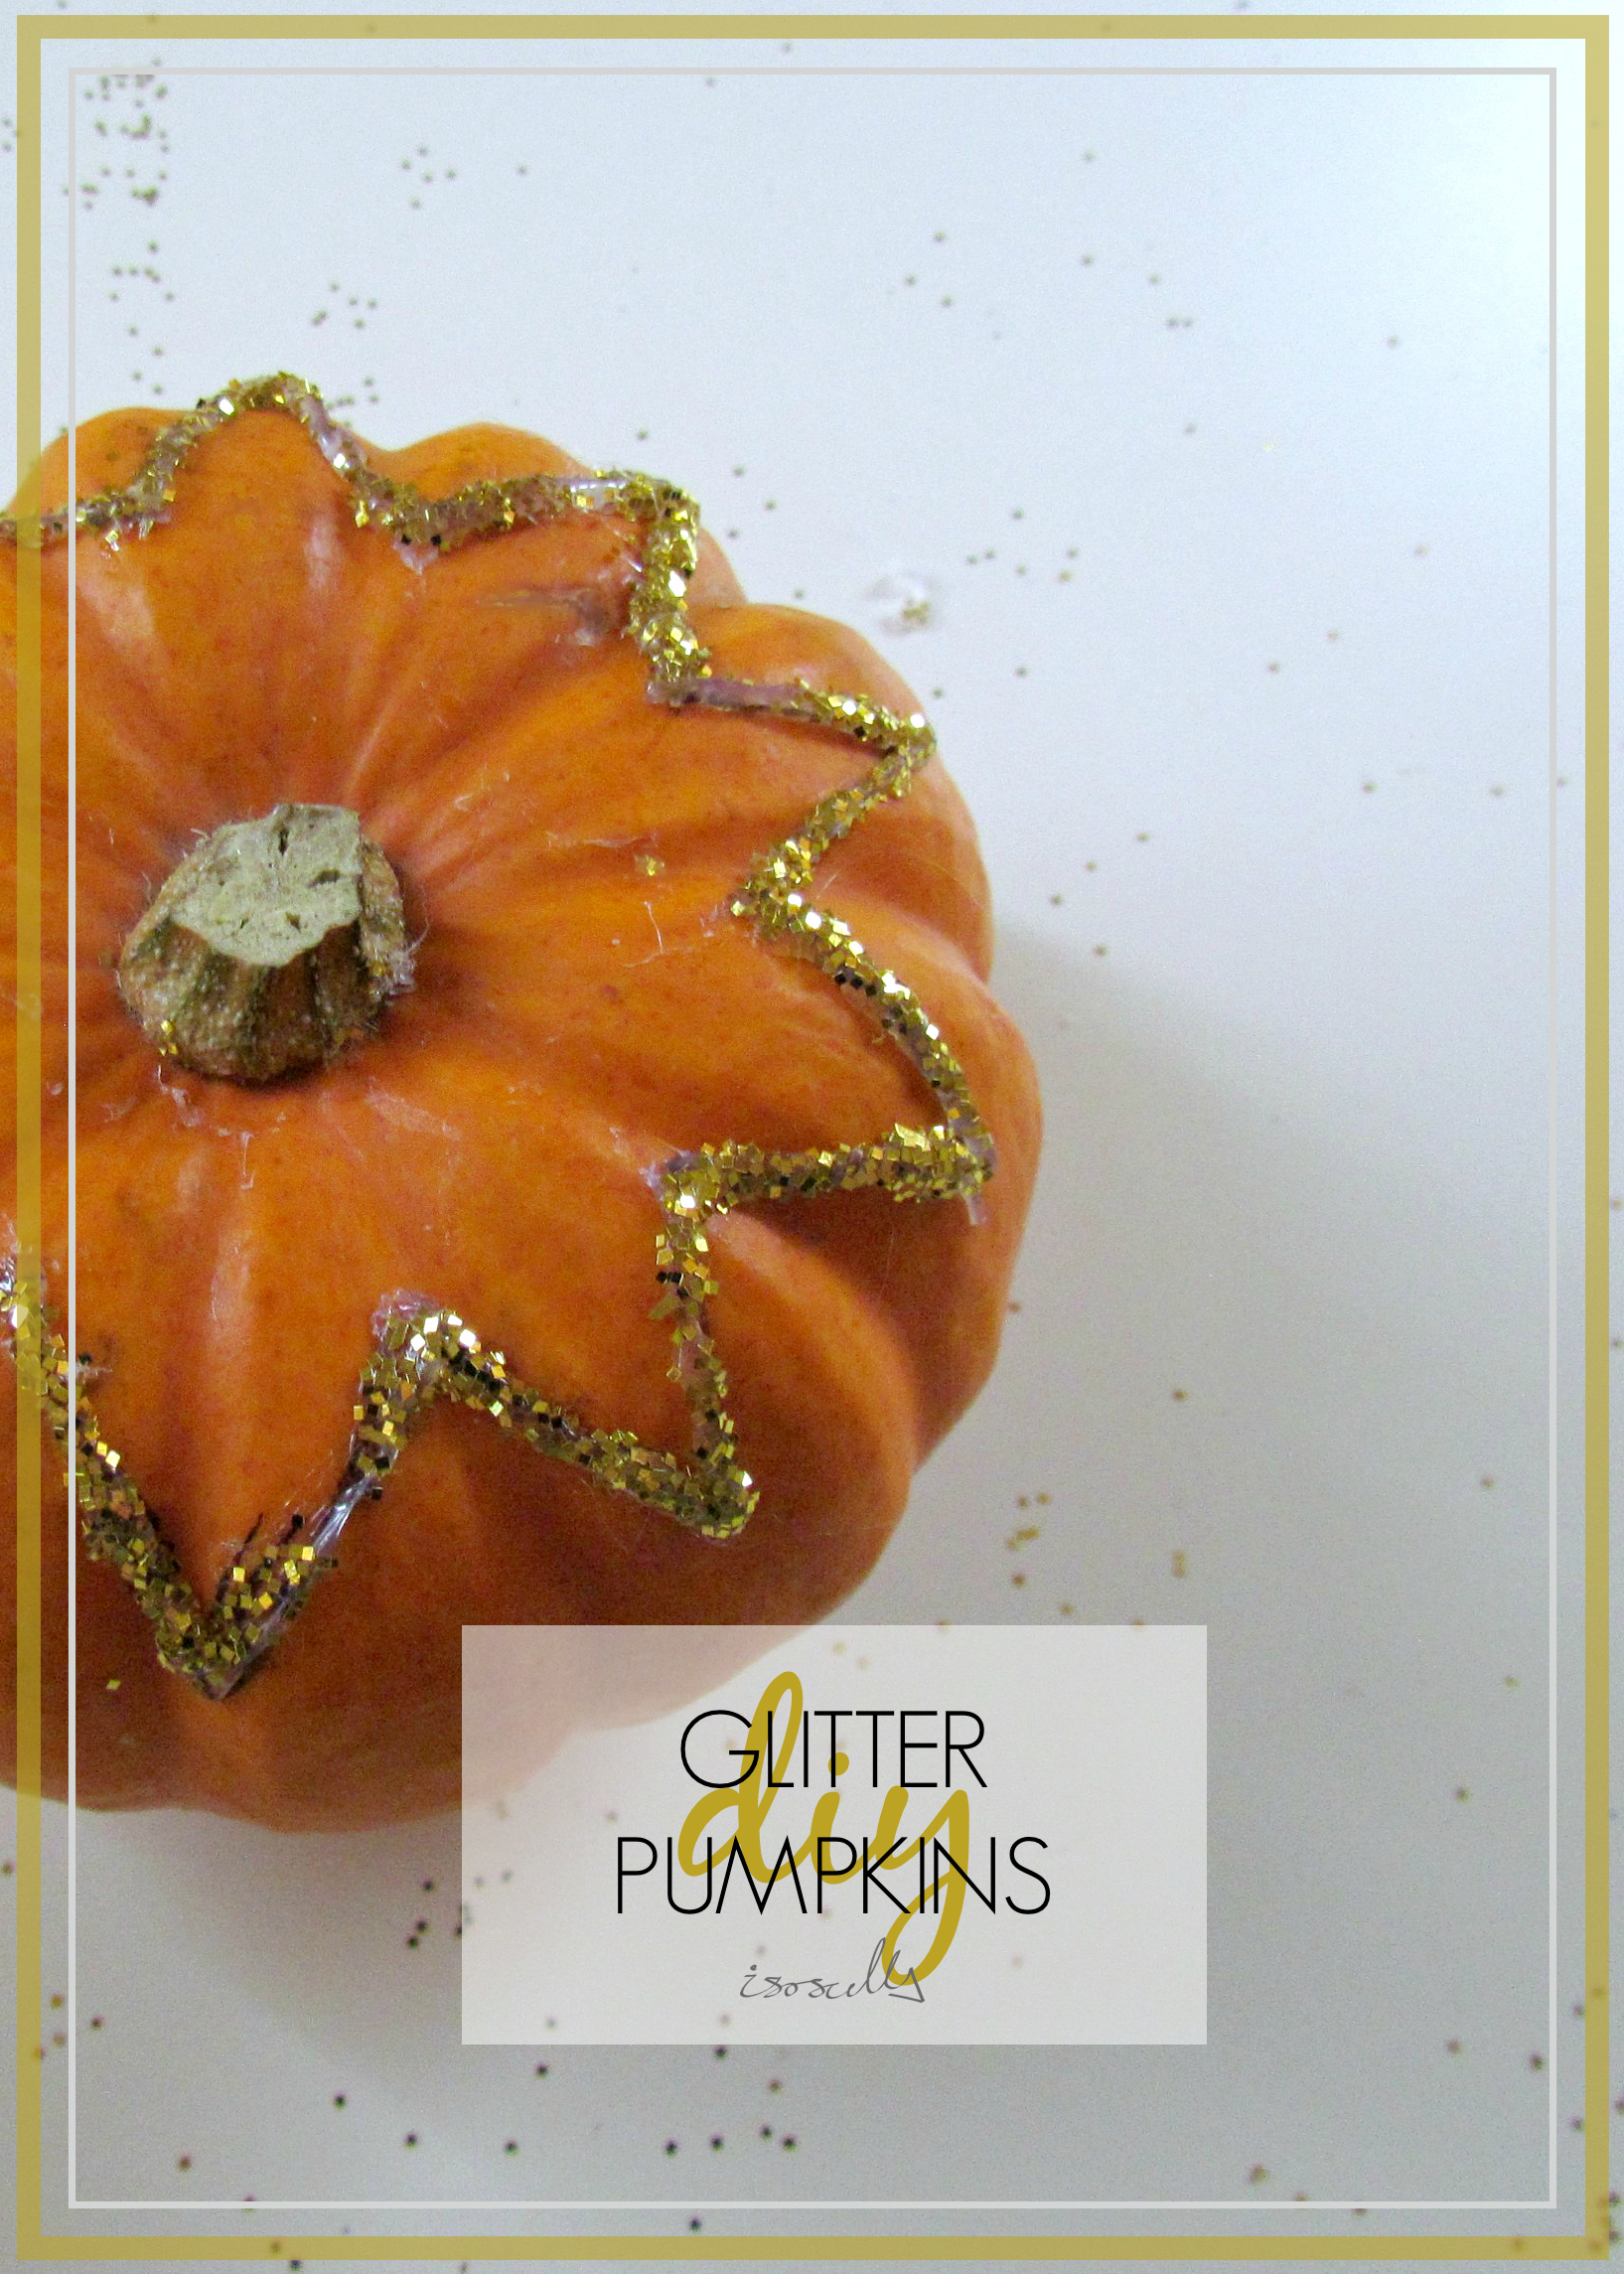 DIY Glitter Pumpkin by Isoscella